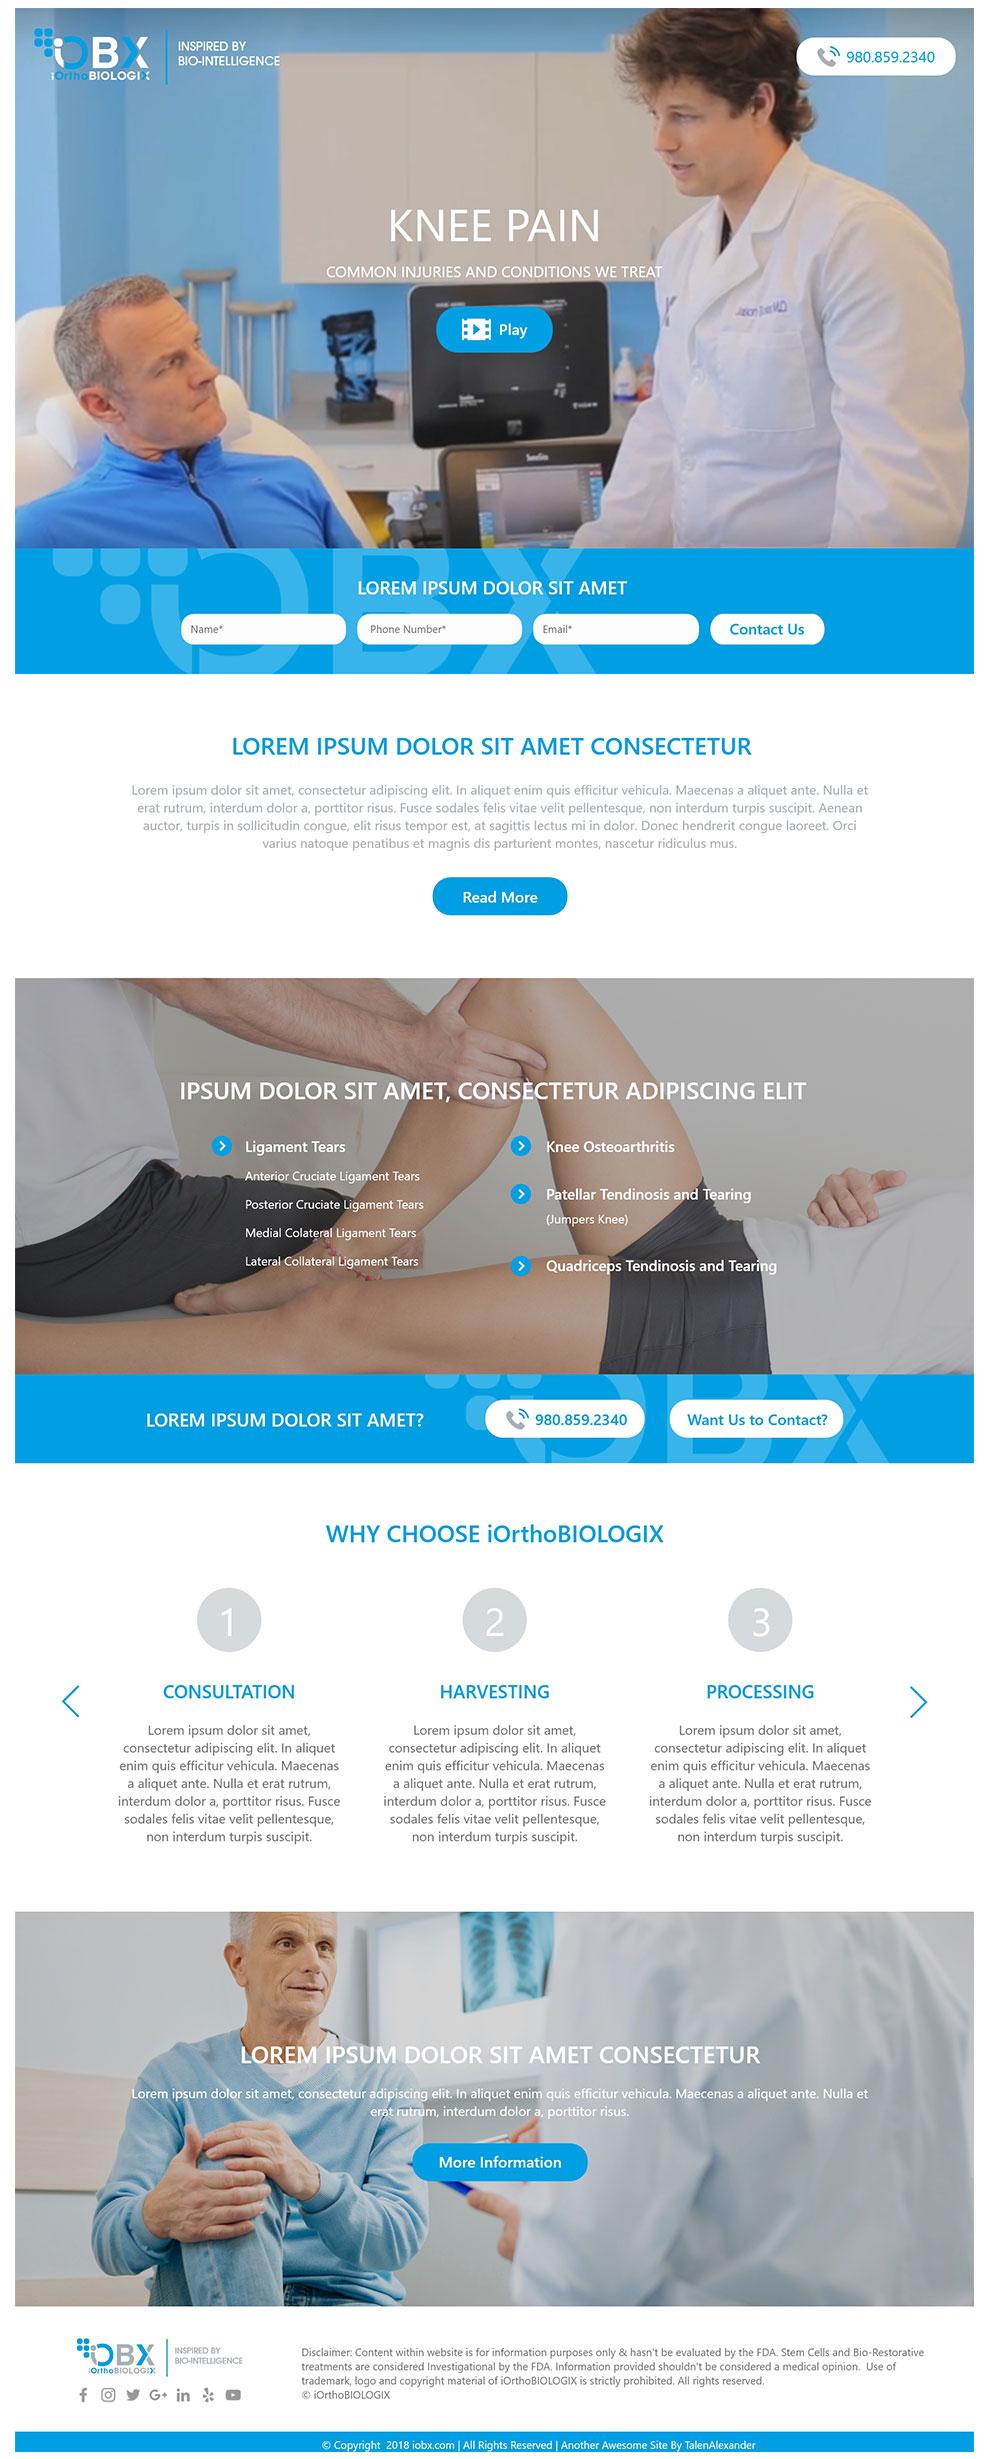 iOBX-Website